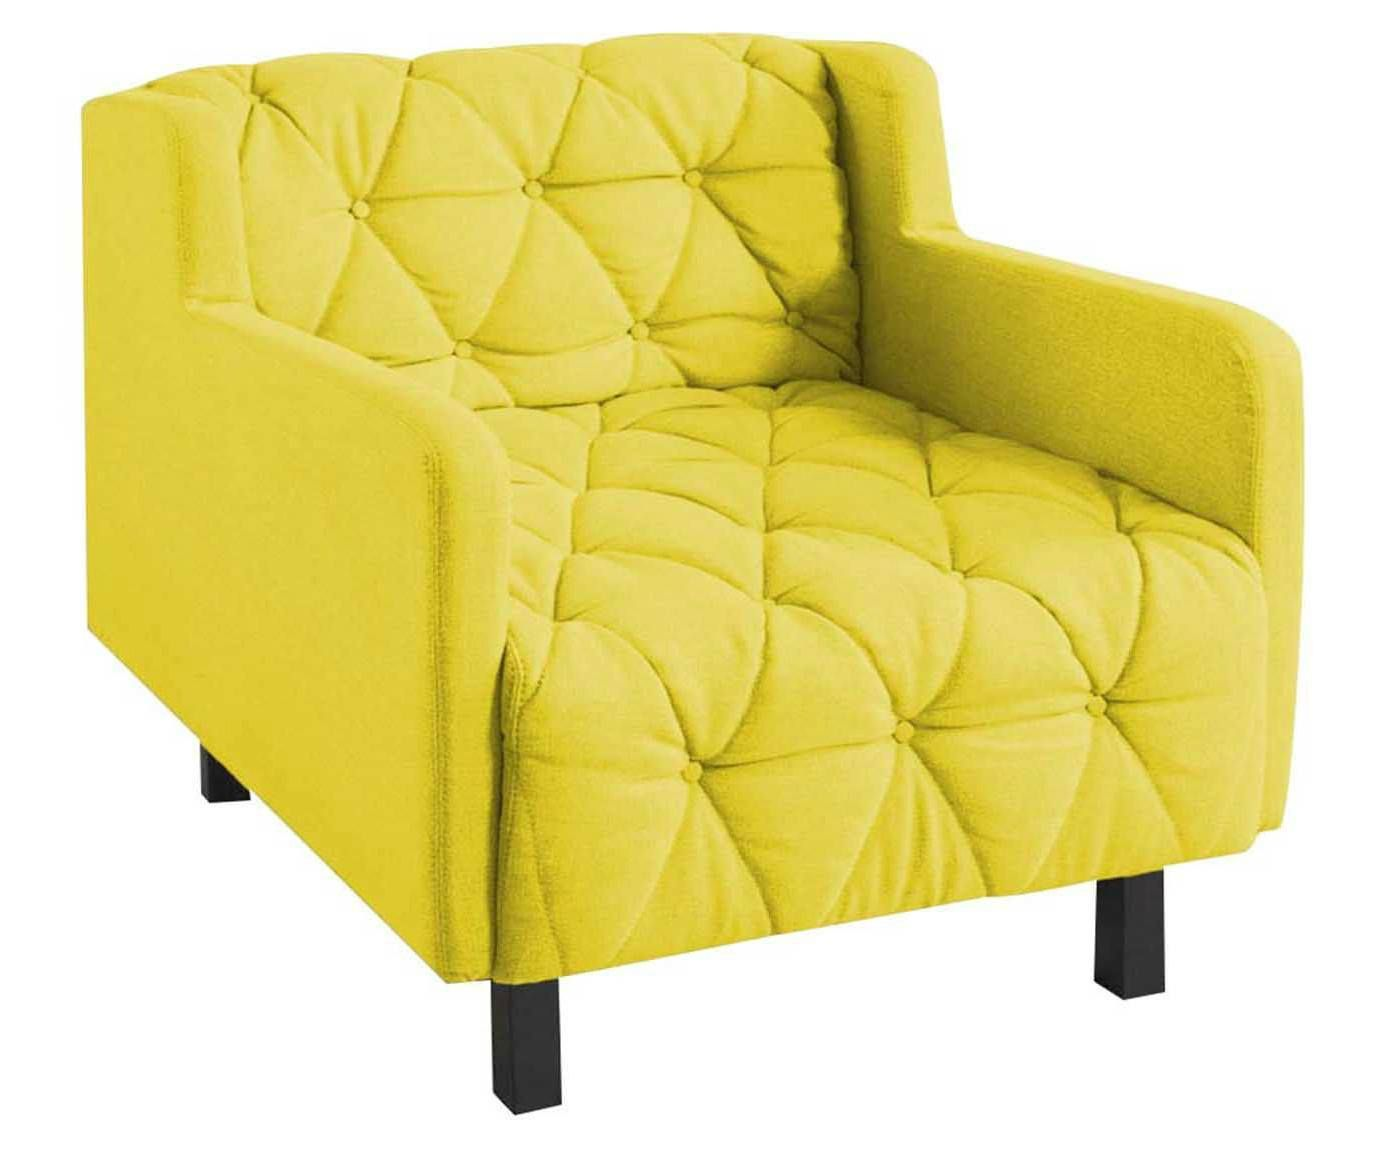 Poltrona coroa baixa amarelo - marcelo rosenbaum | Westwing.com.br